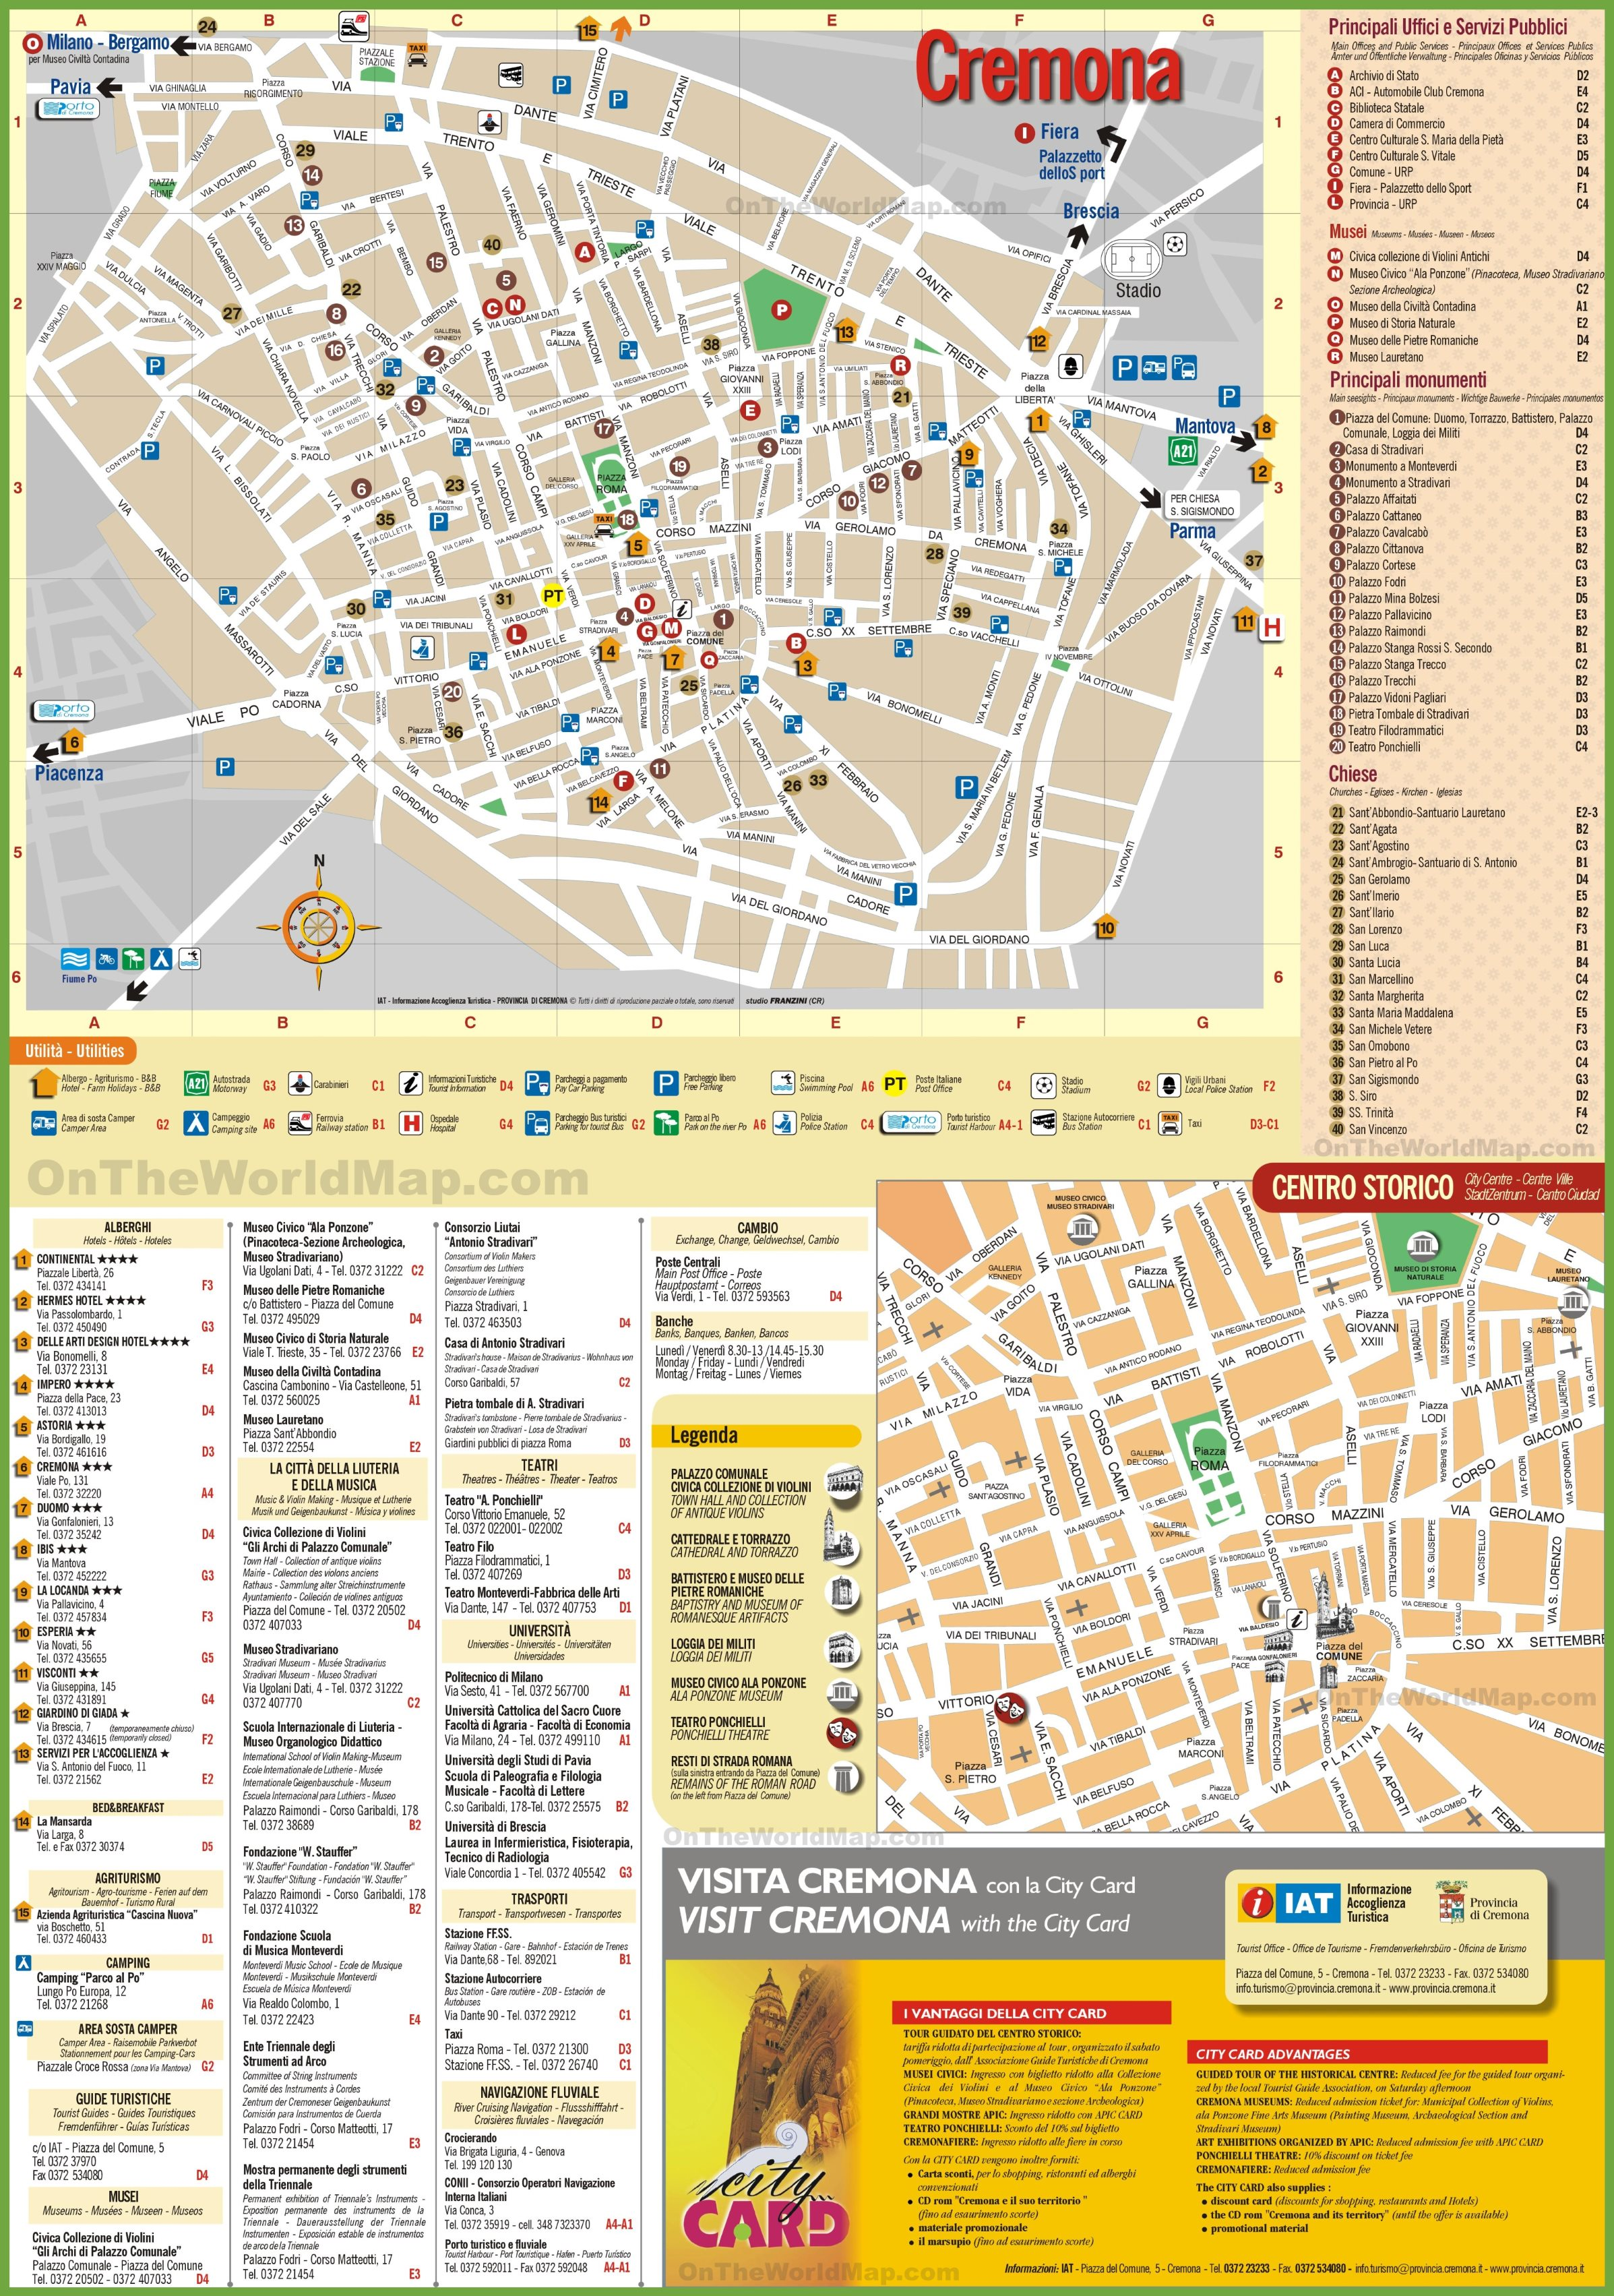 Cremona tourist map